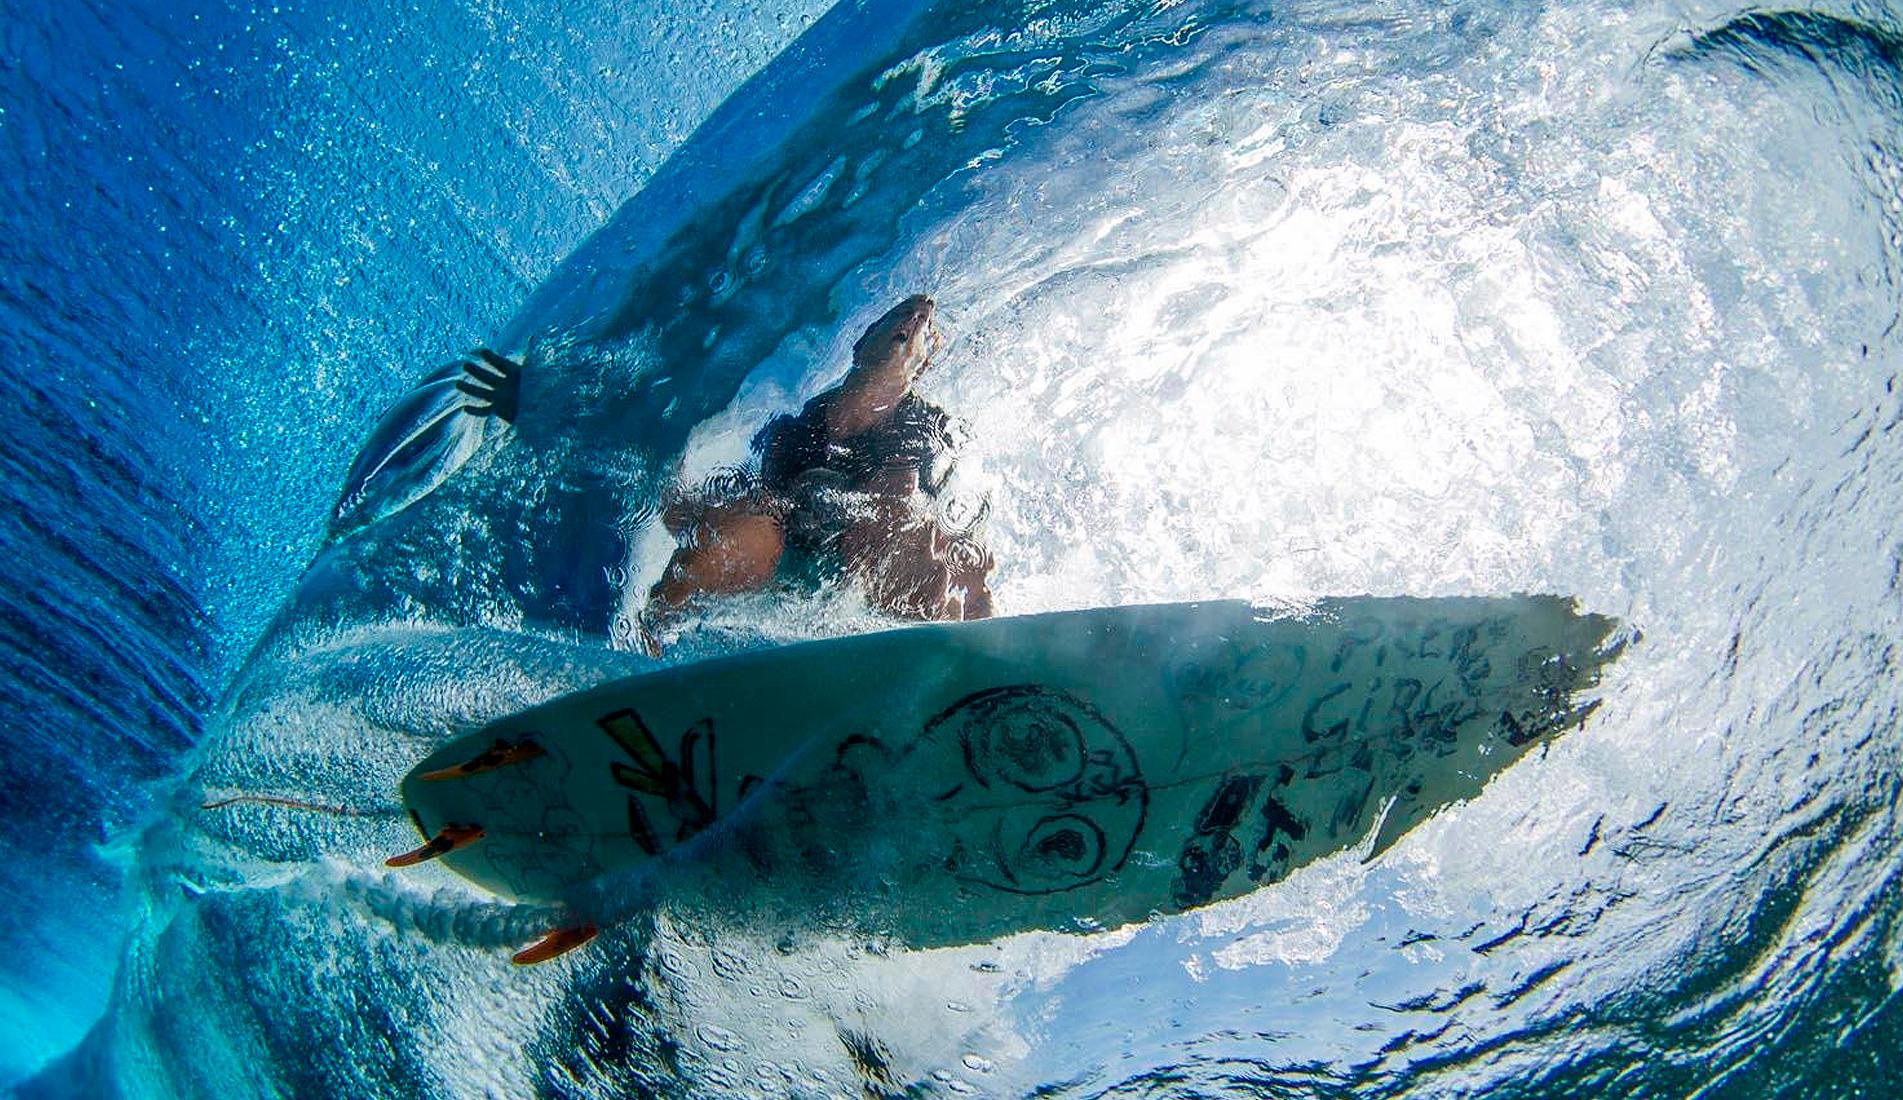 fotos-adrenalina-watersports-18